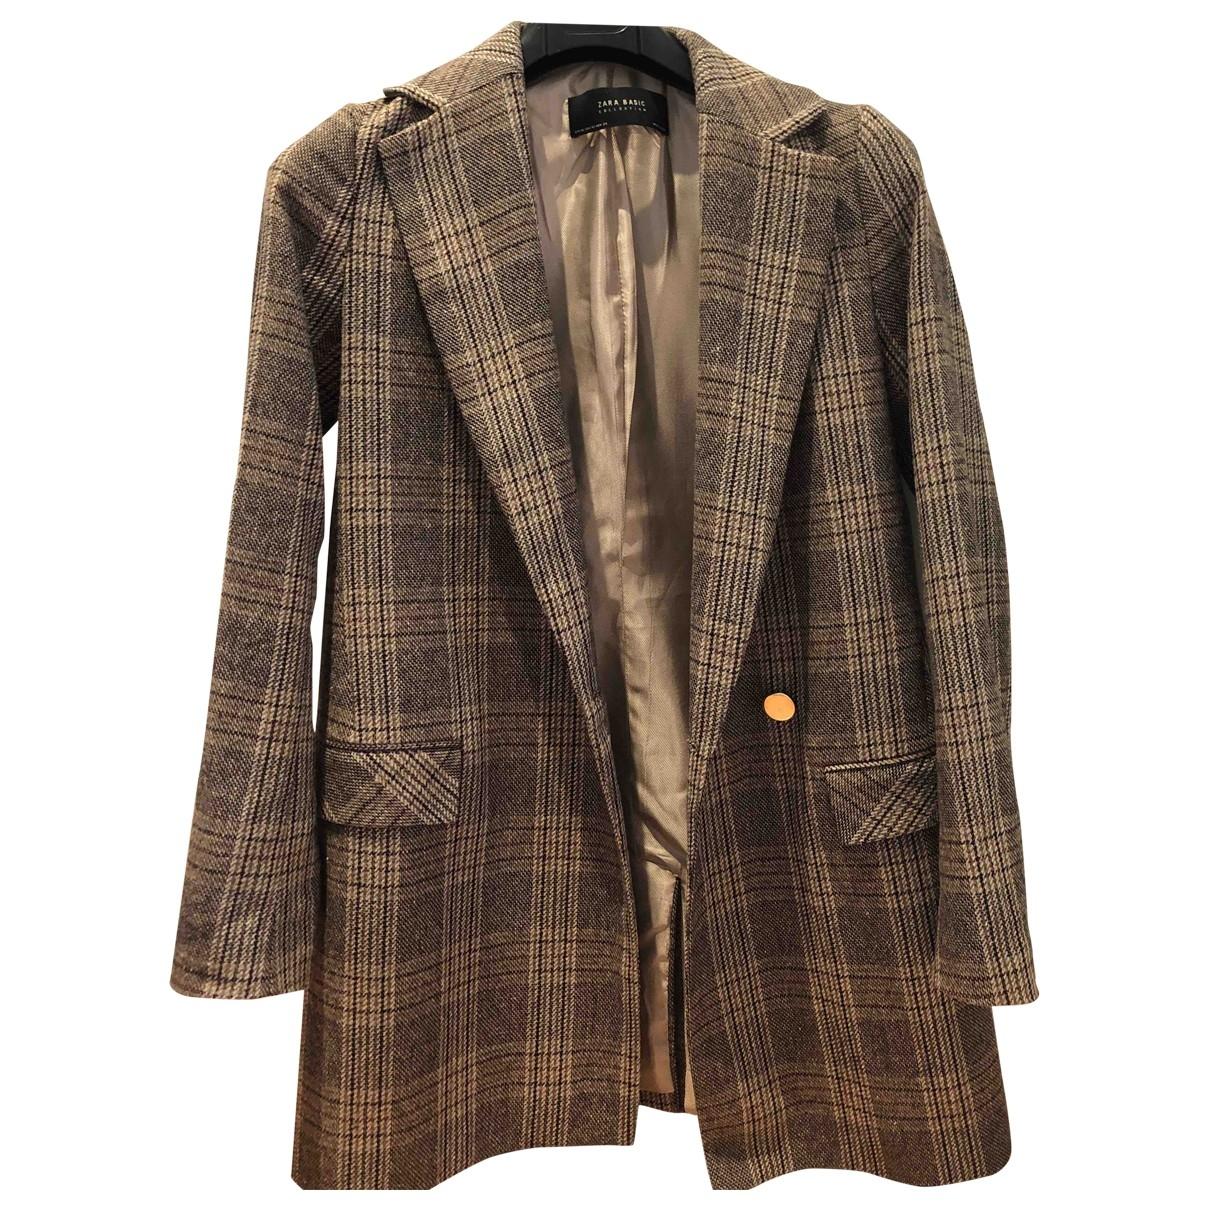 Zara \N Brown Wool jacket for Women XS International